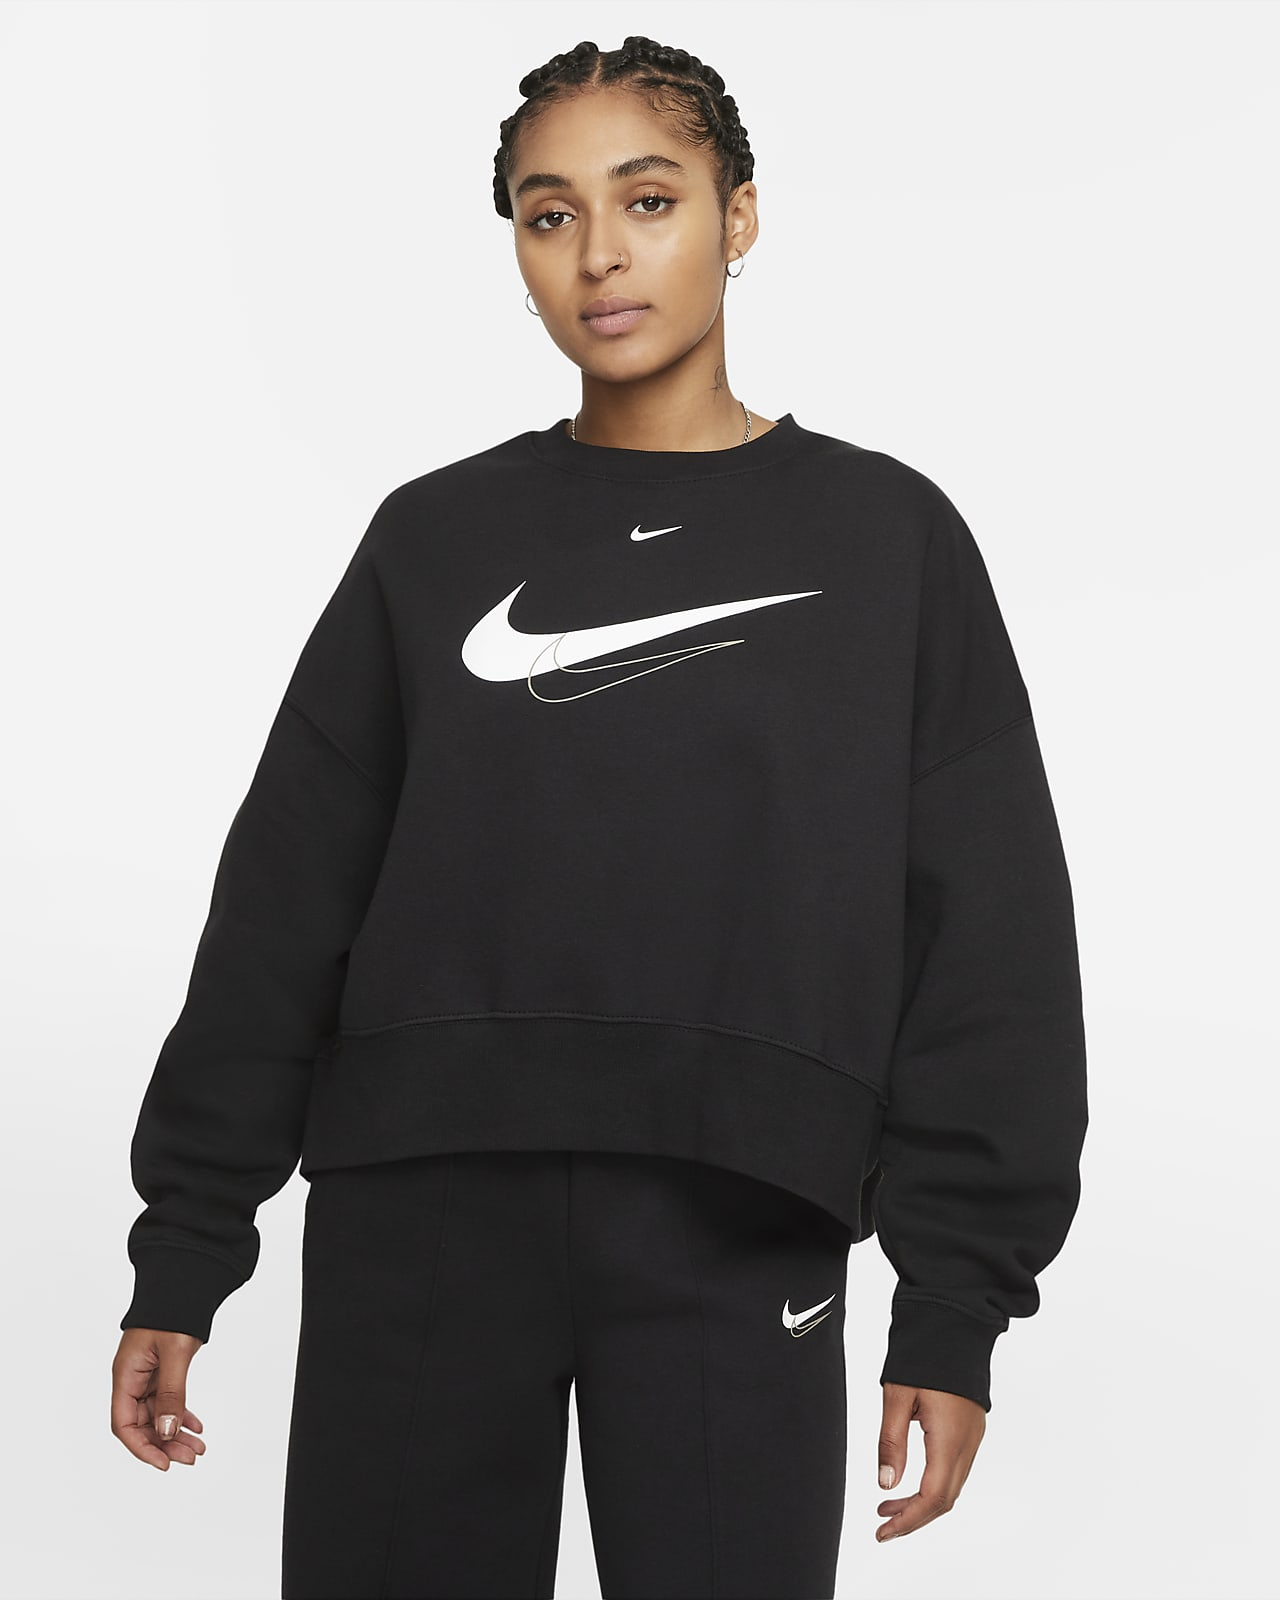 Sweatshirt recortada de lã cardada Nike Sportswear para mulher